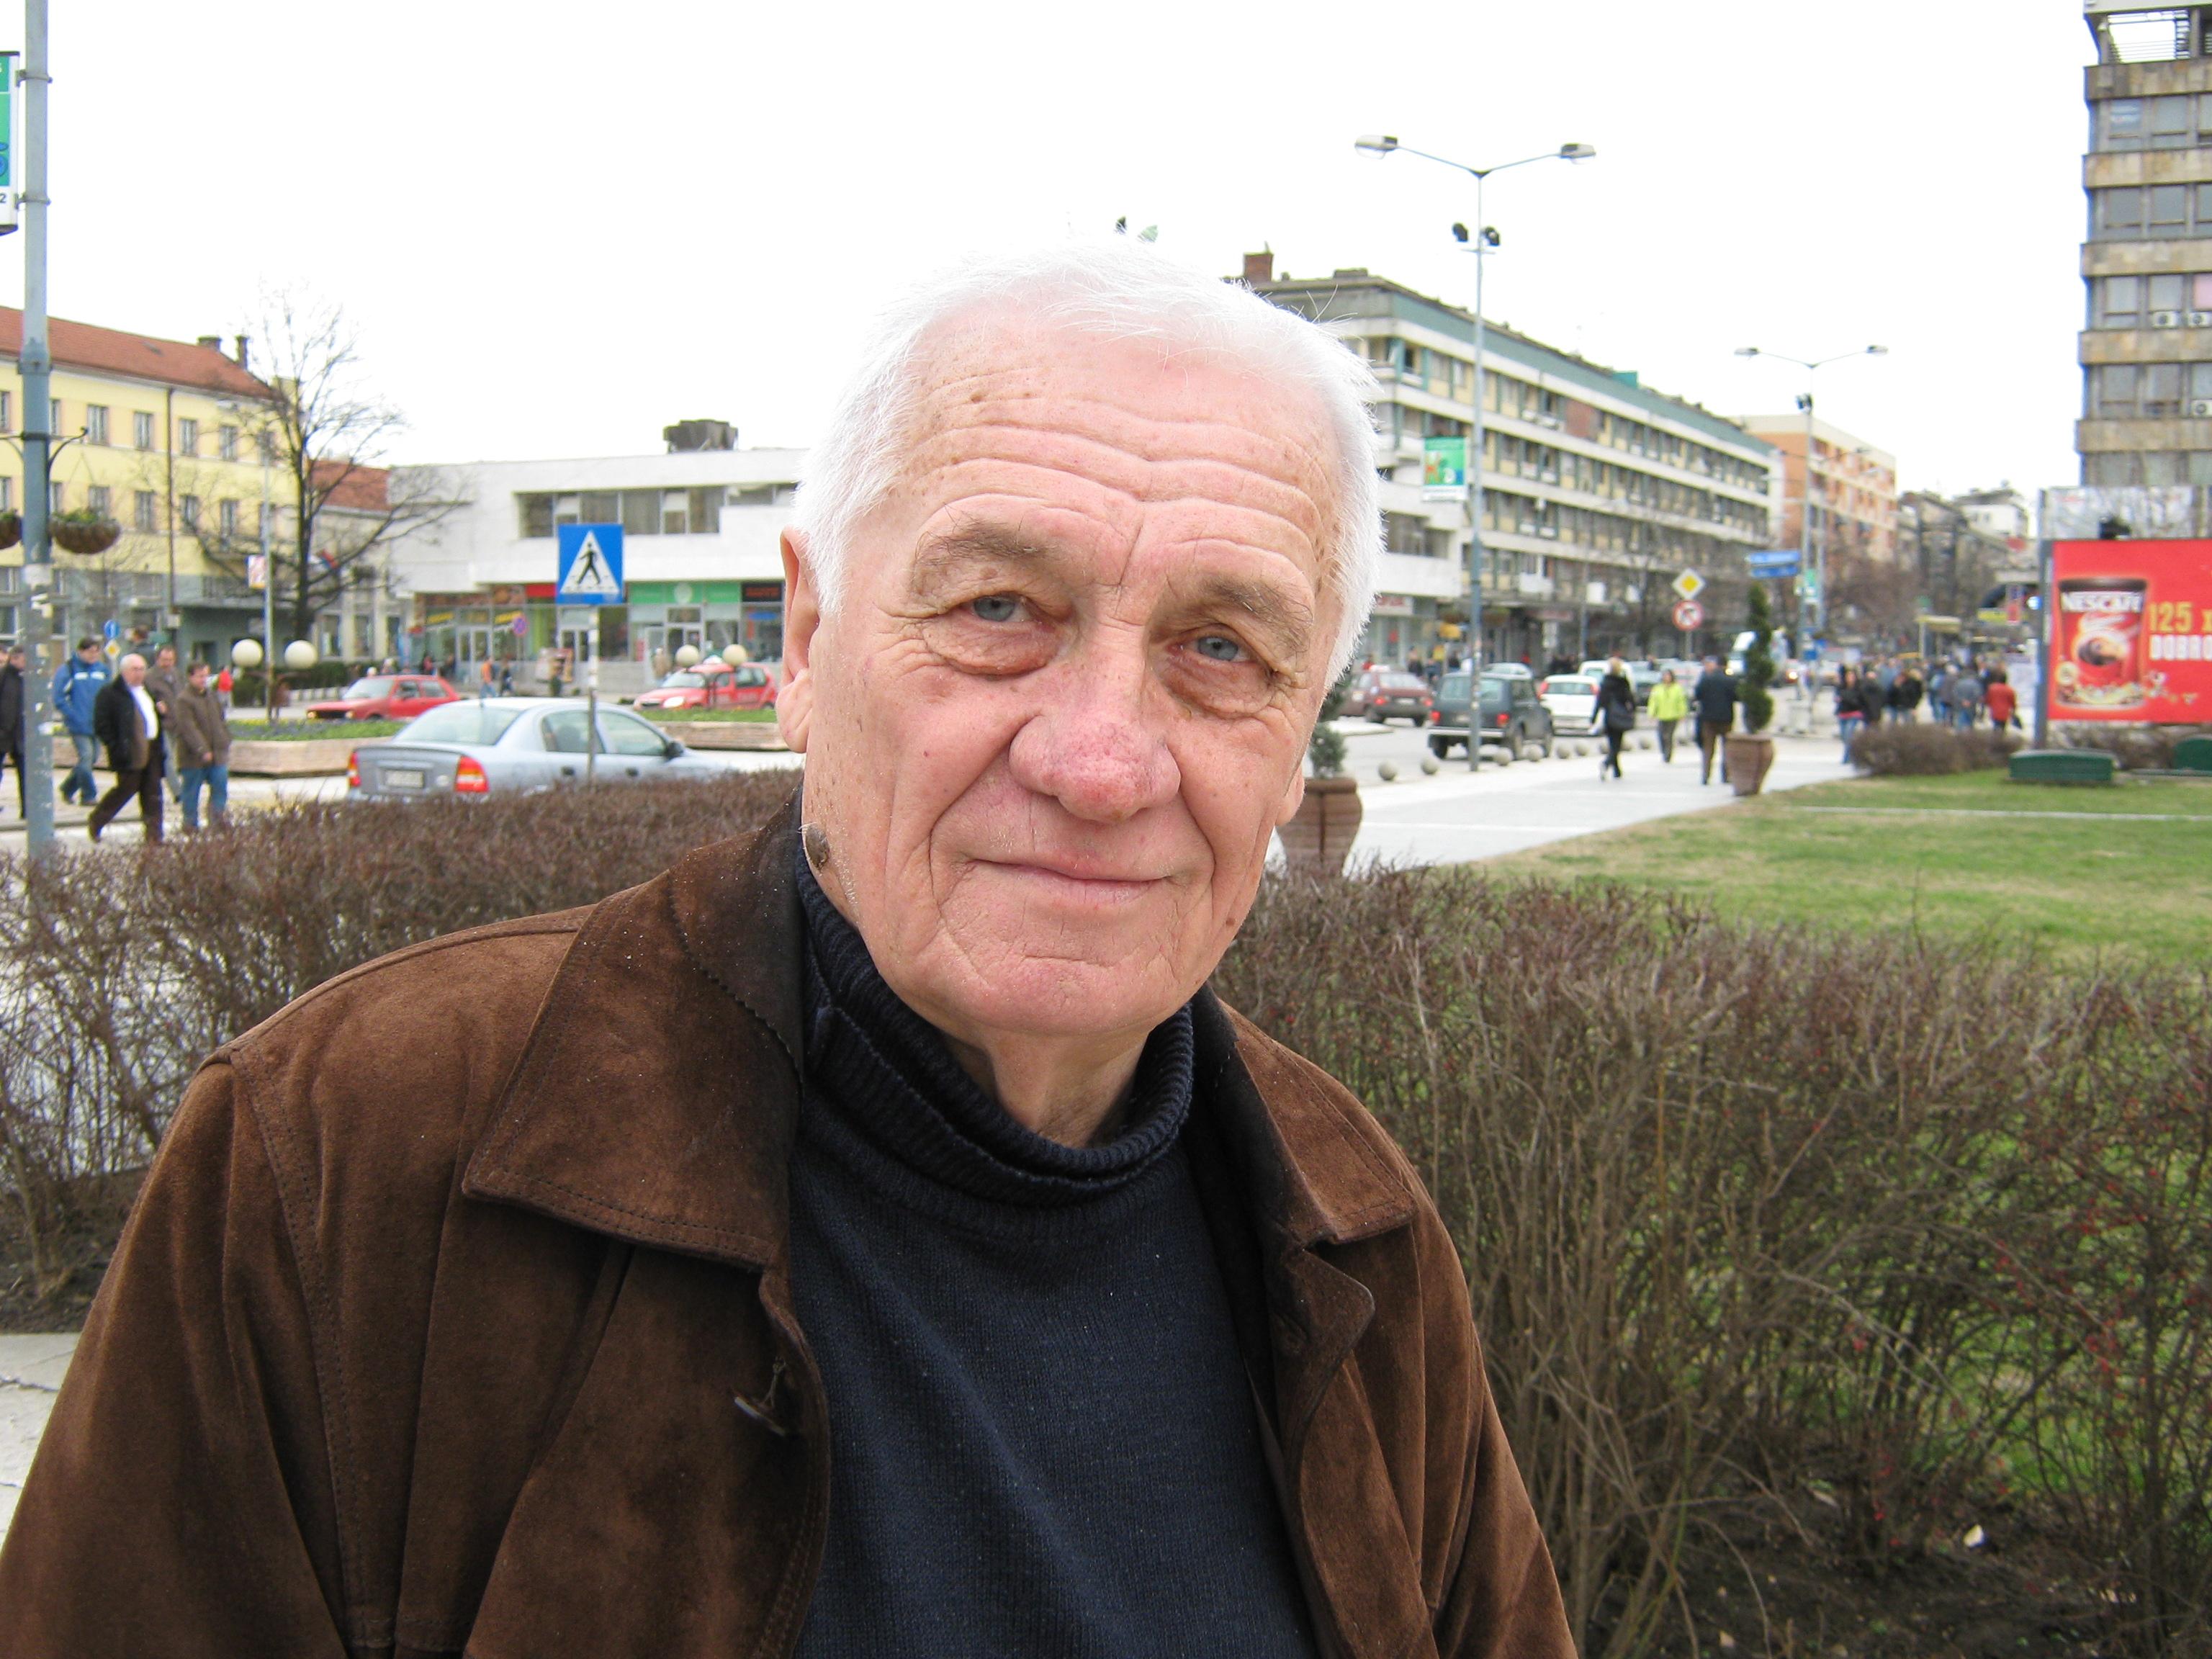 misa-rajkovic-2